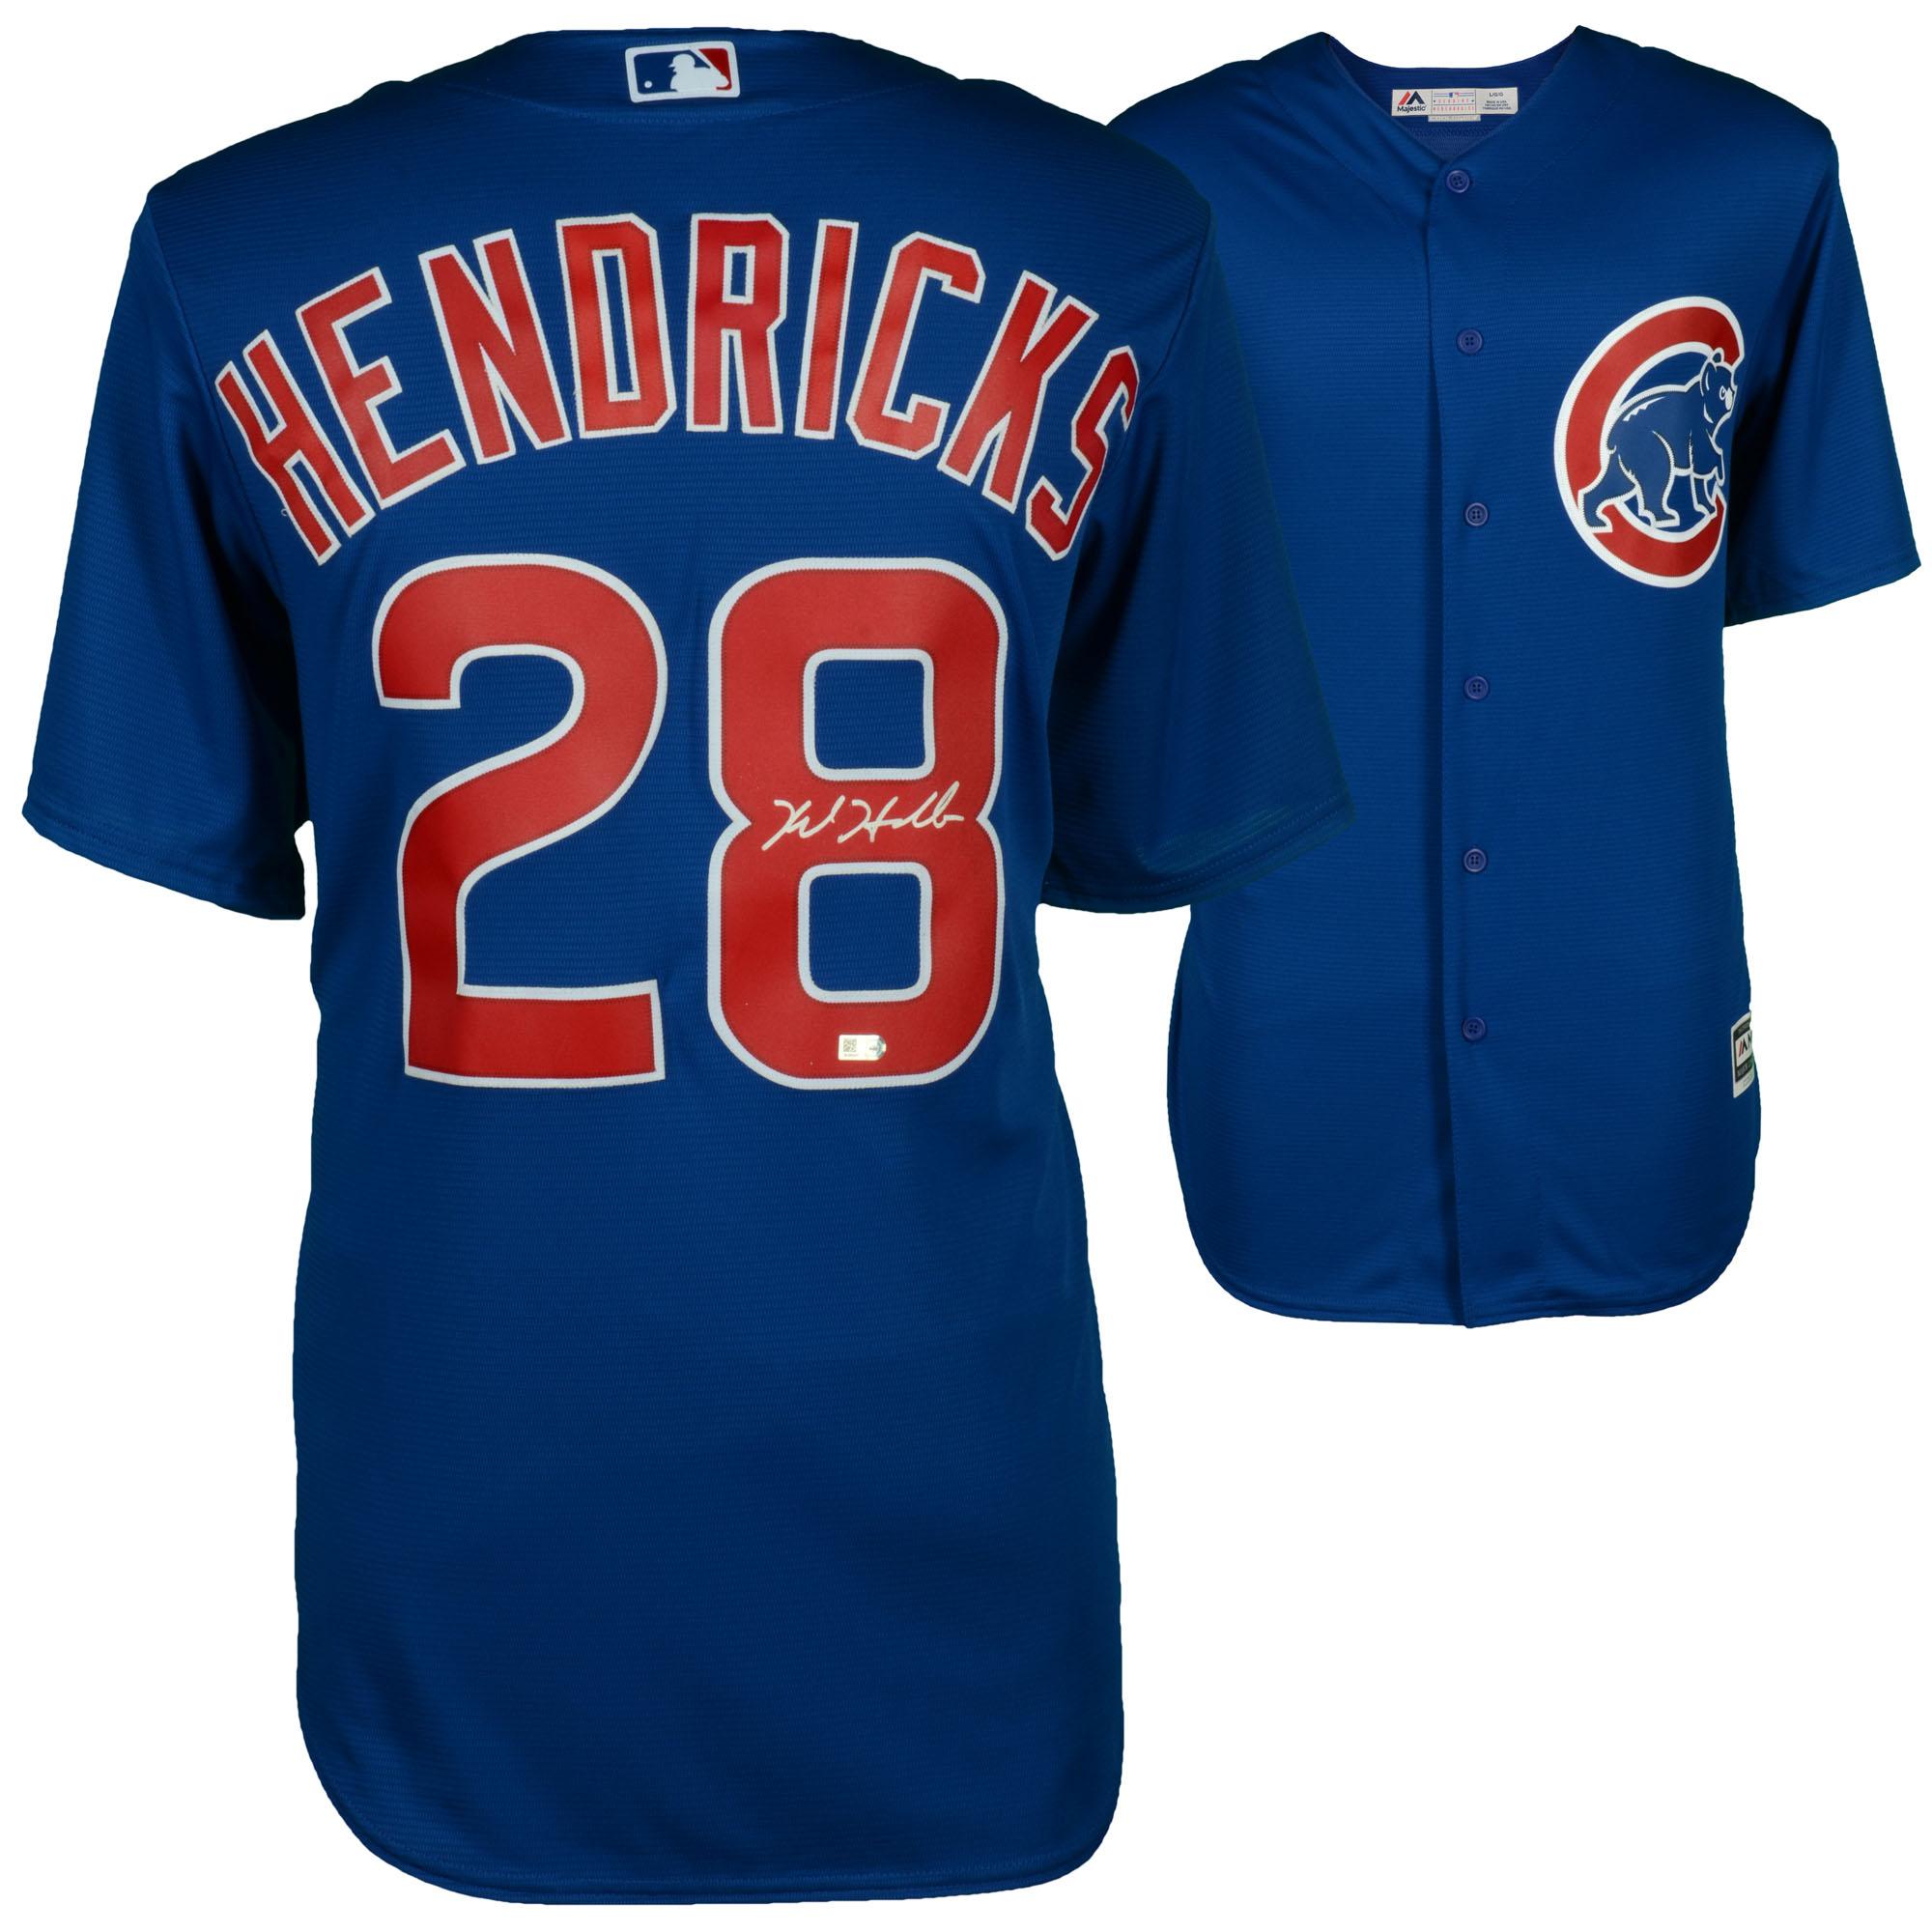 Kyle Hendricks Chicago Cubs Fanatics Authentic Autographed Majestic Blue Replica Jersey - No Size